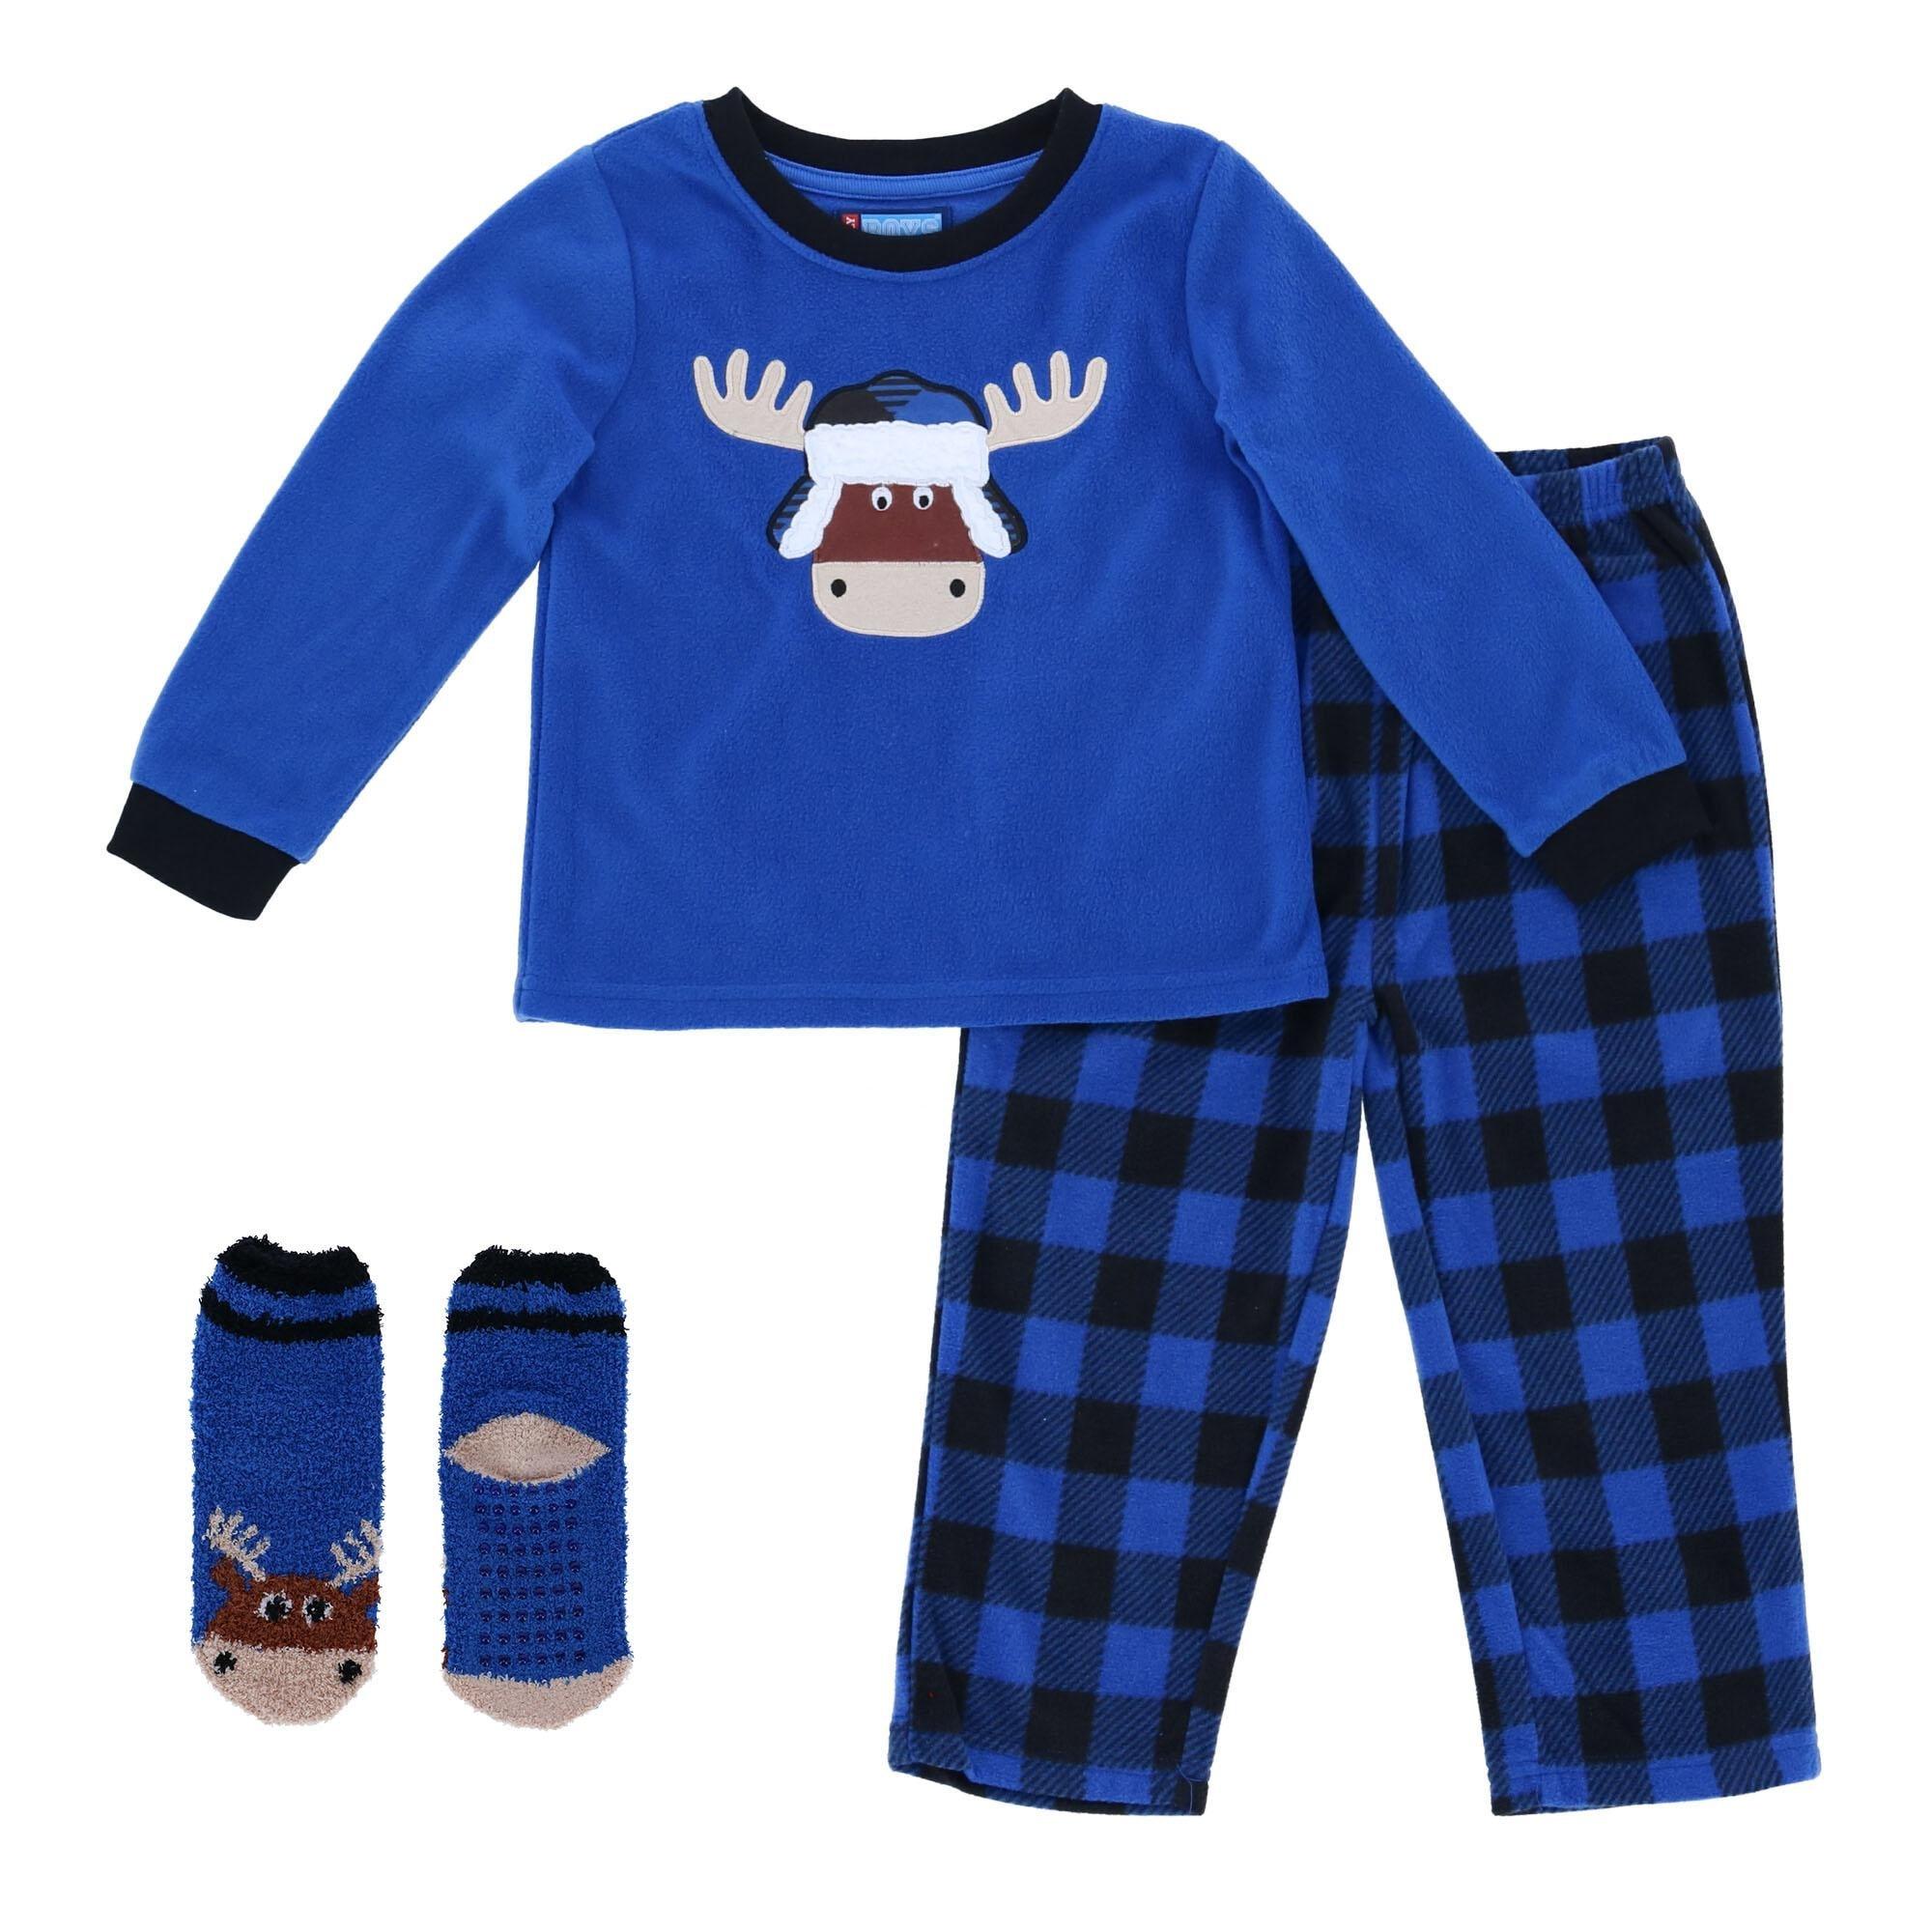 Emoji Pajamas Sz 2T 4T PJs Set Pants #Weekend Blue Orange Pizza Boys